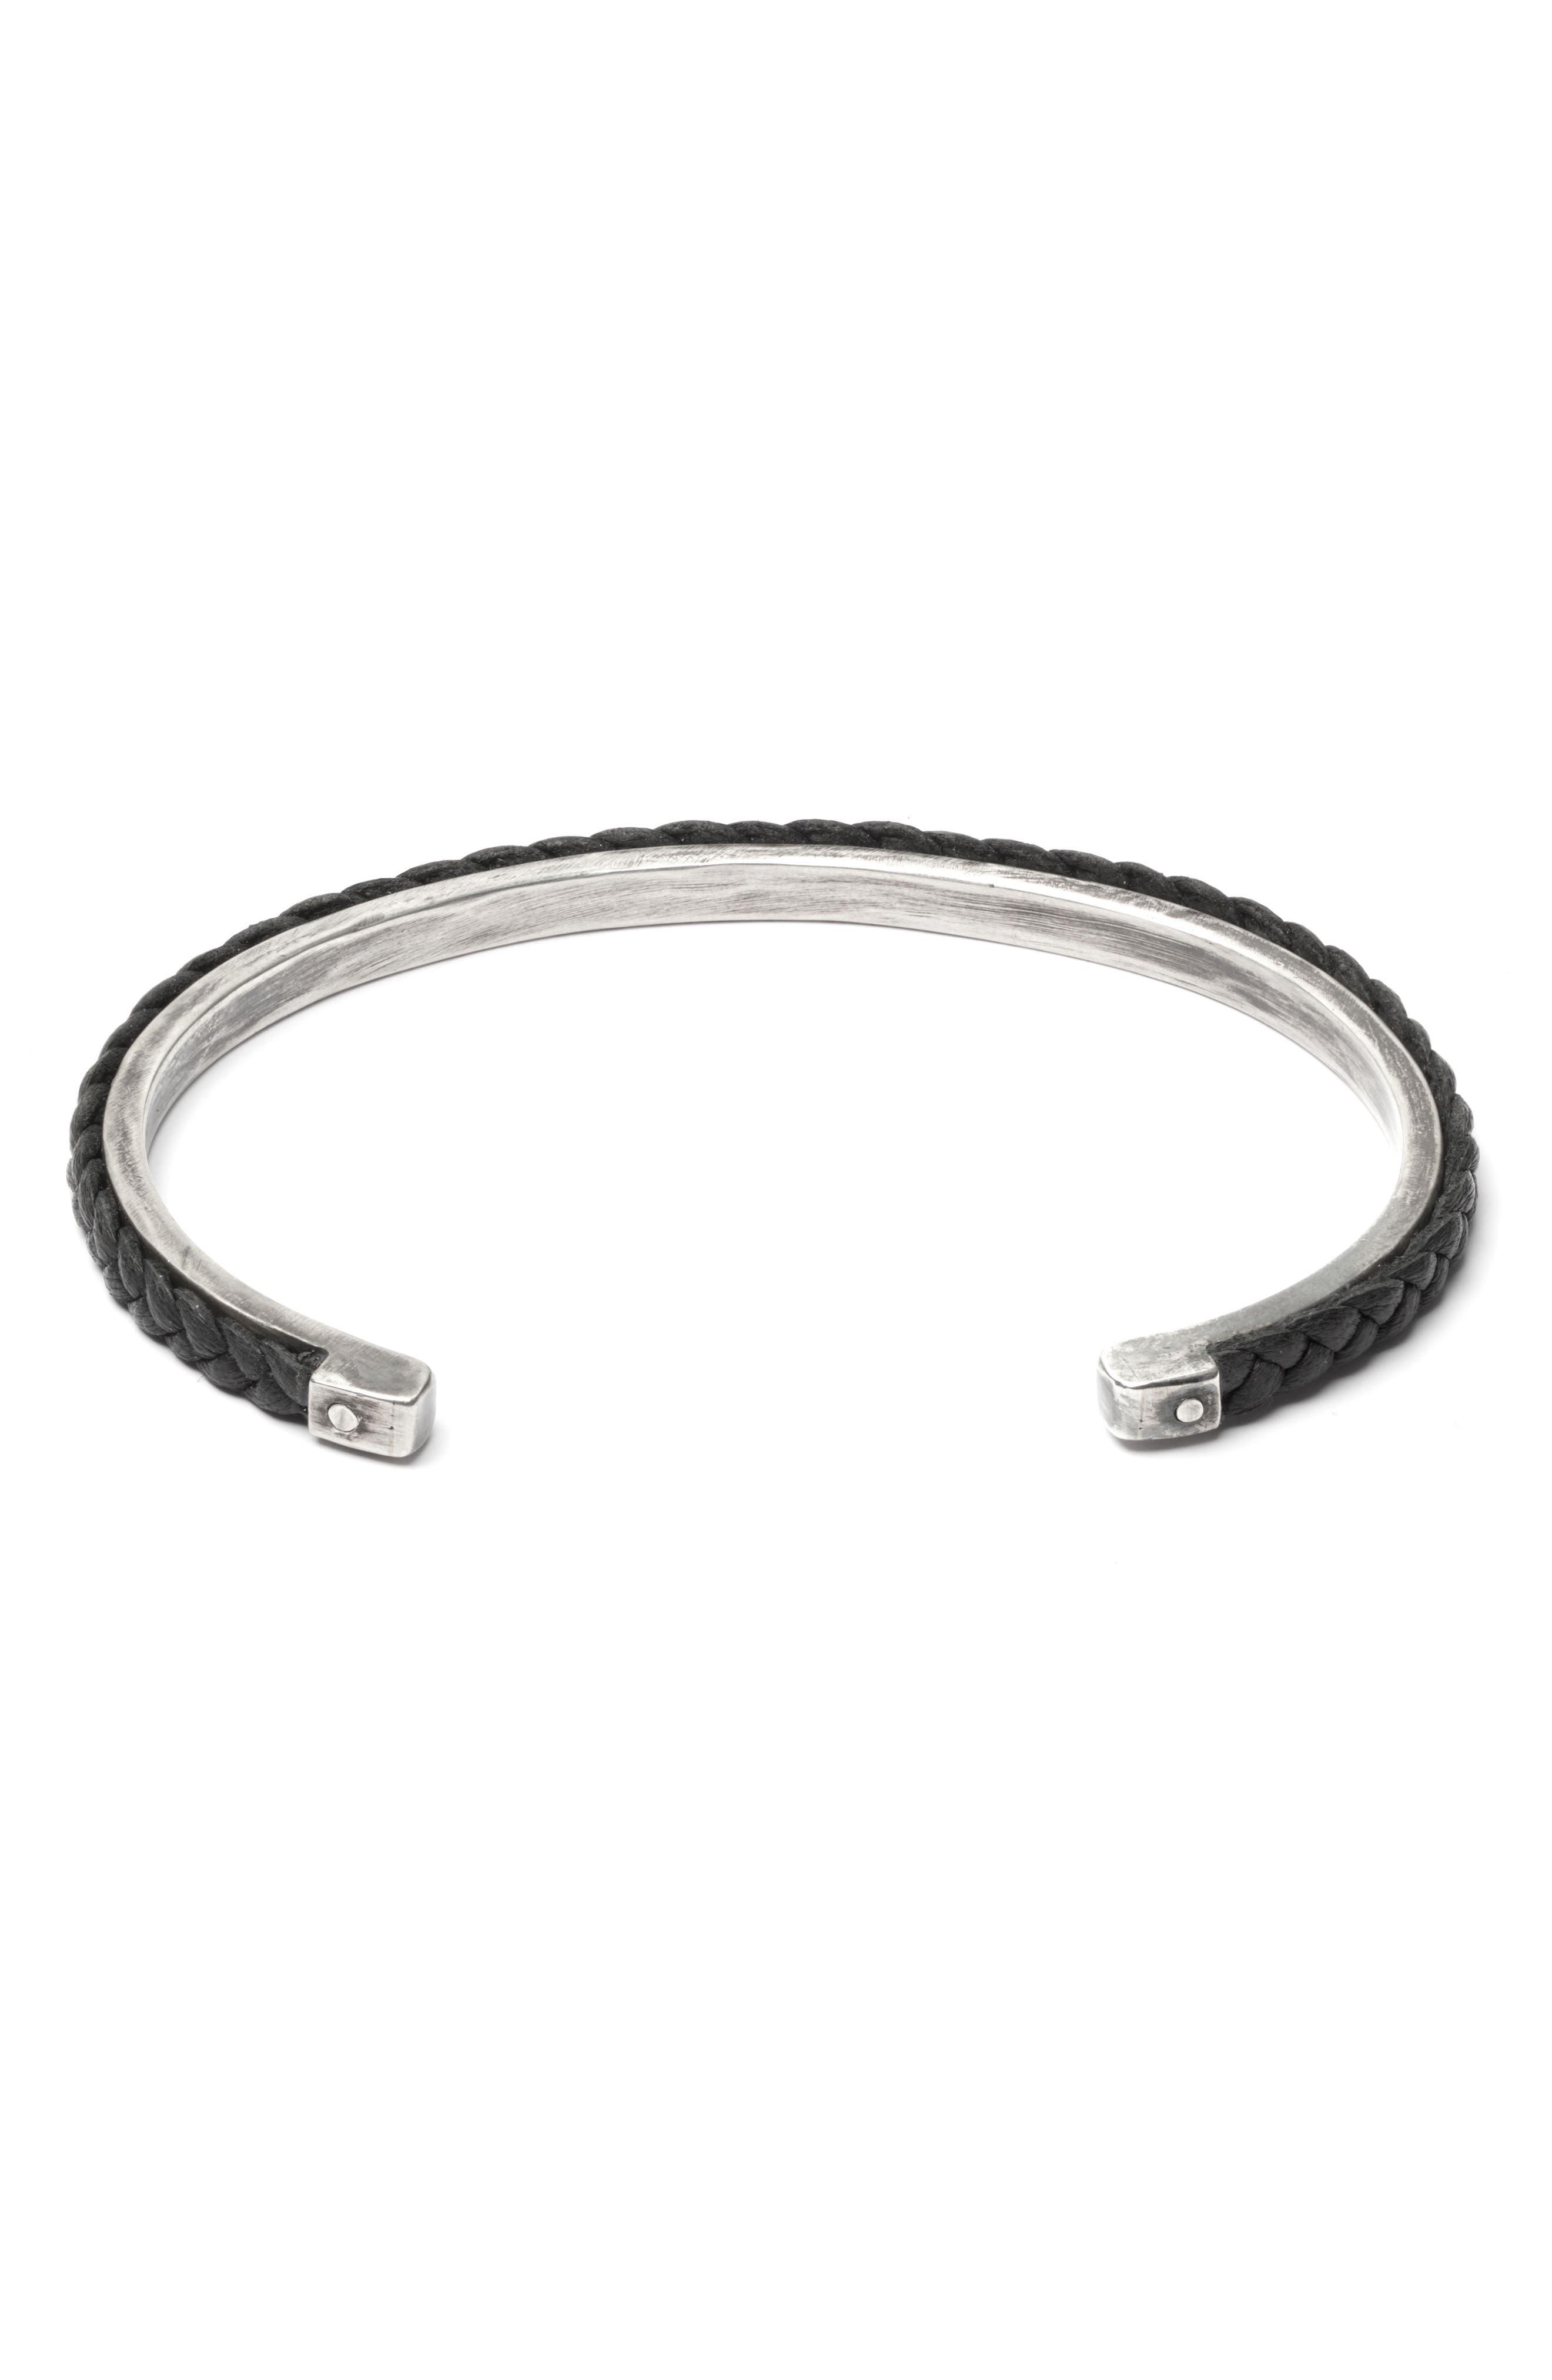 Braided Cuff,                         Main,                         color, Black/Silver